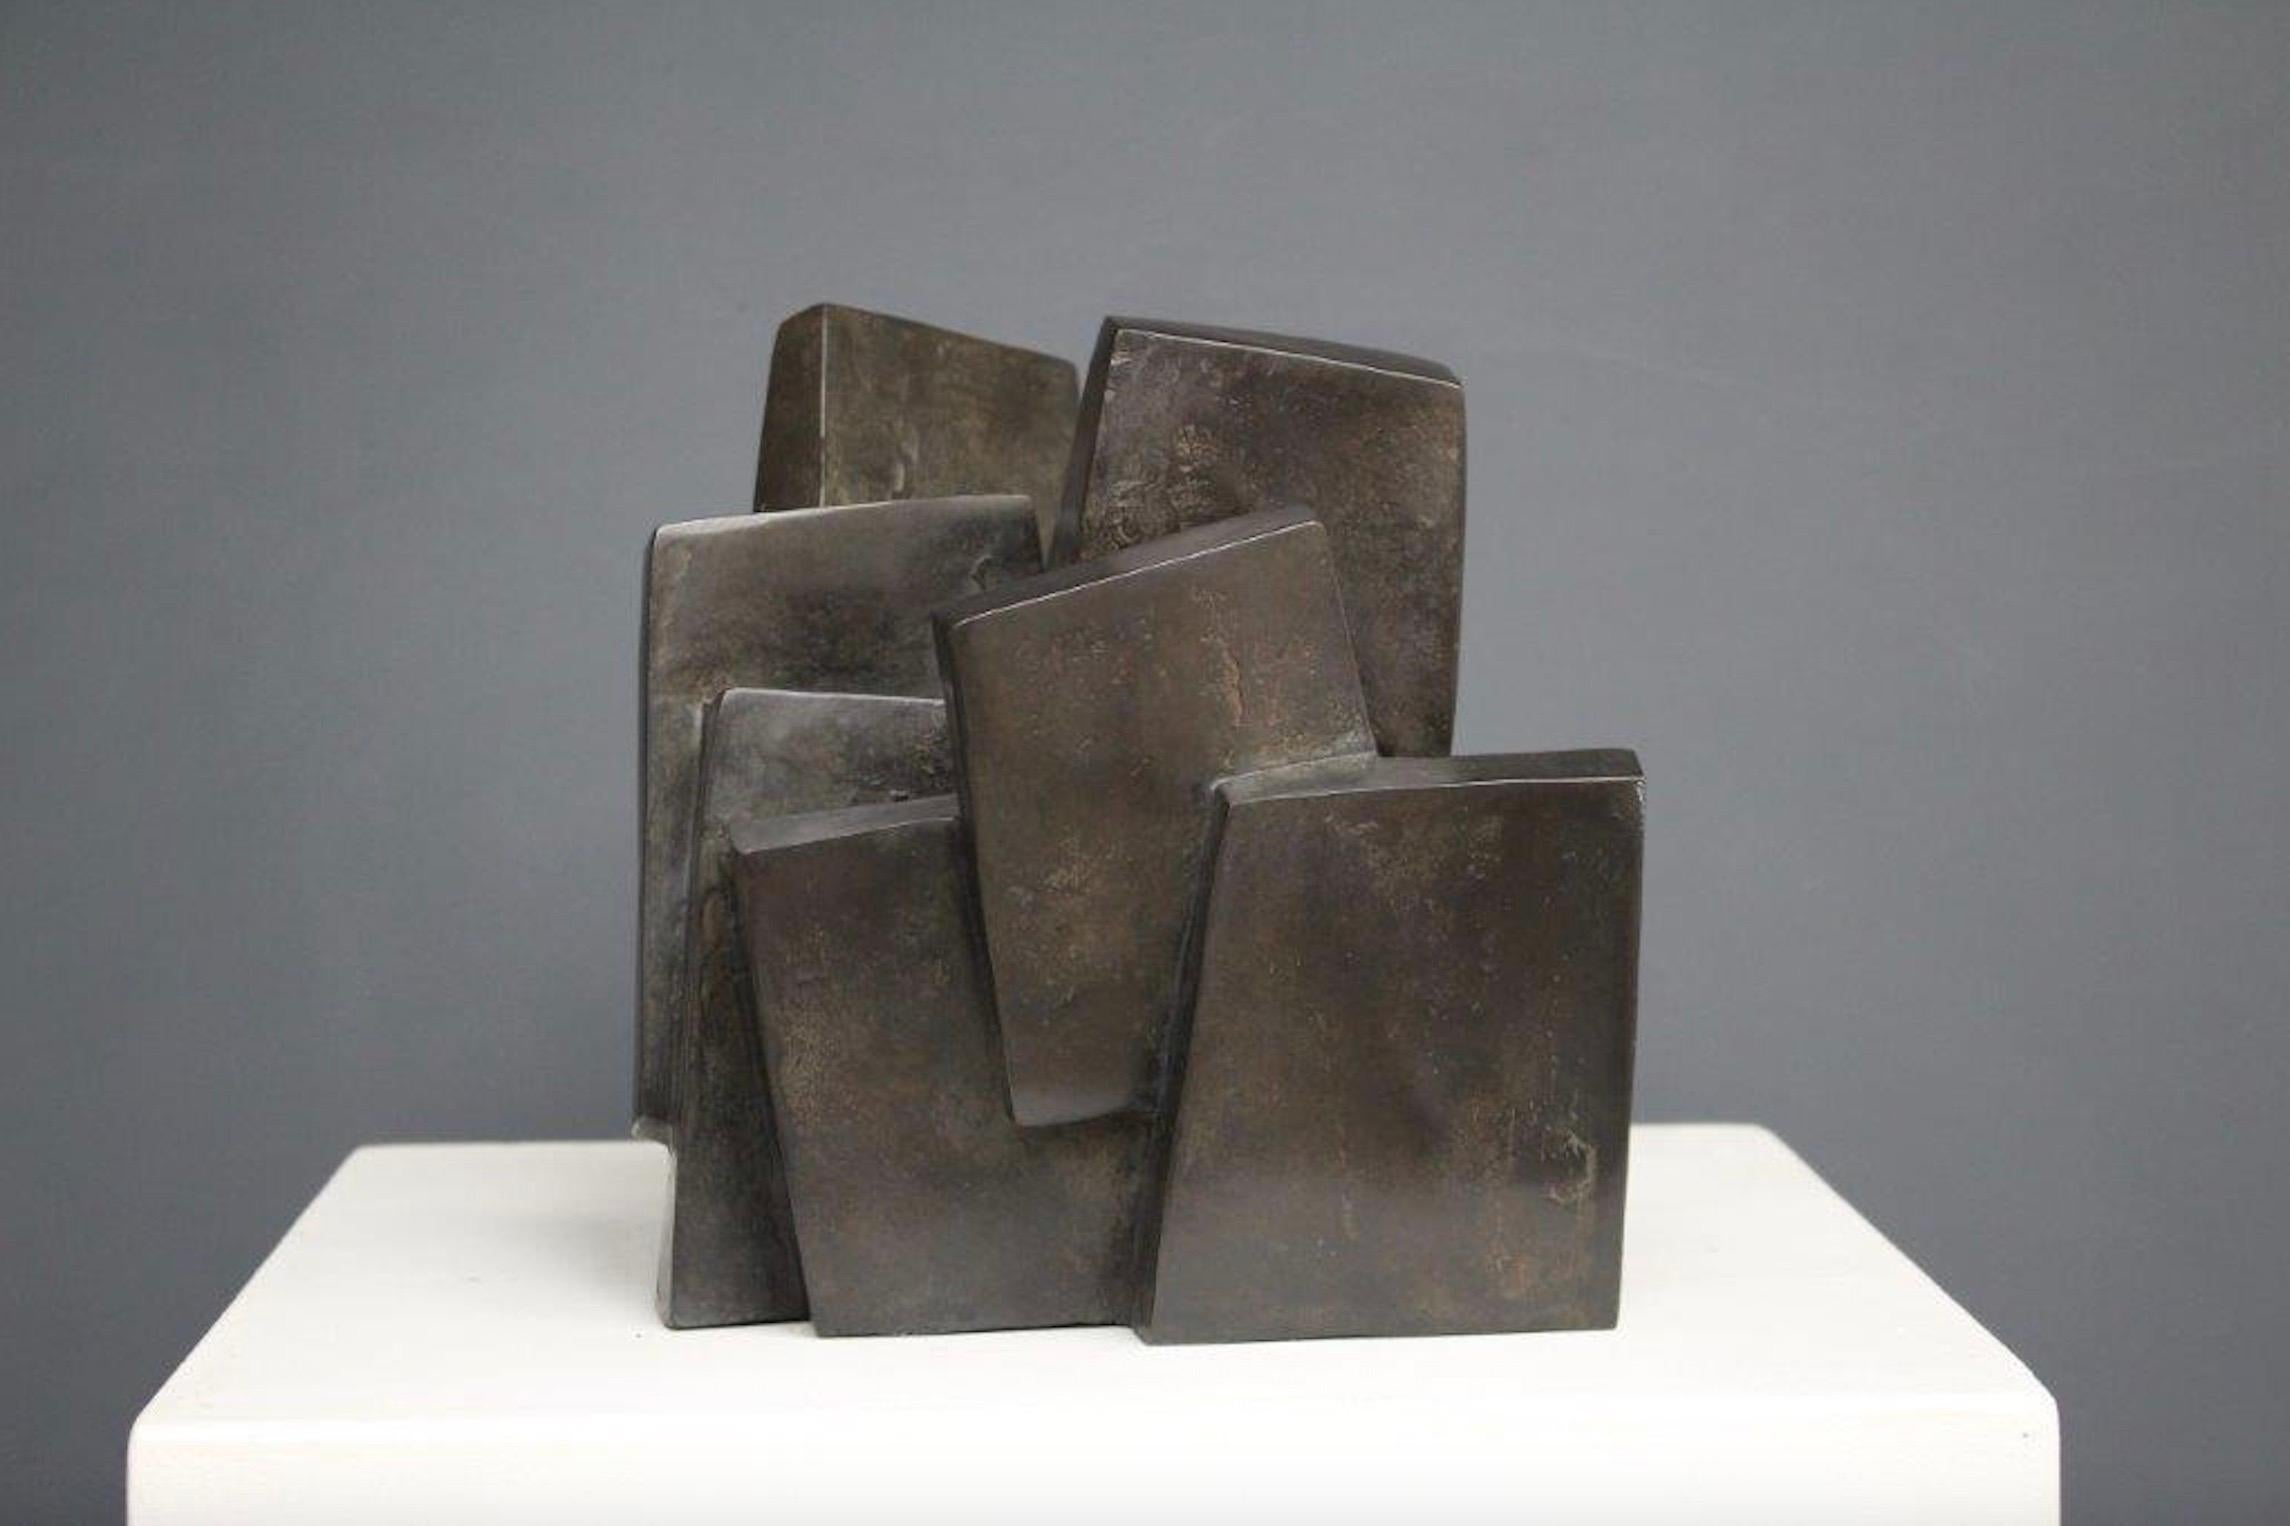 Suspension, Abstract Geometric Bronze Sculpture